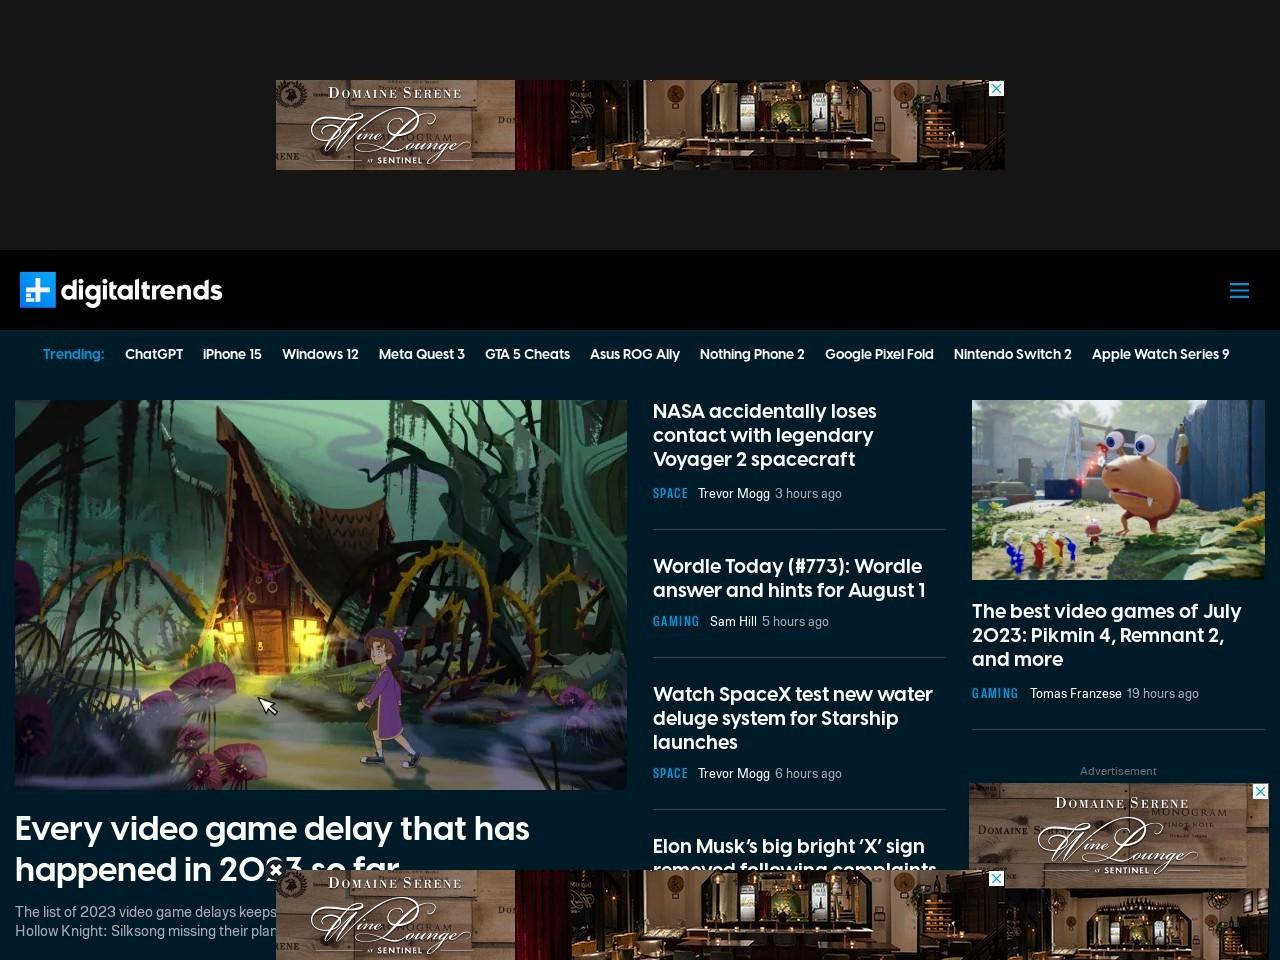 digitaltrends.com